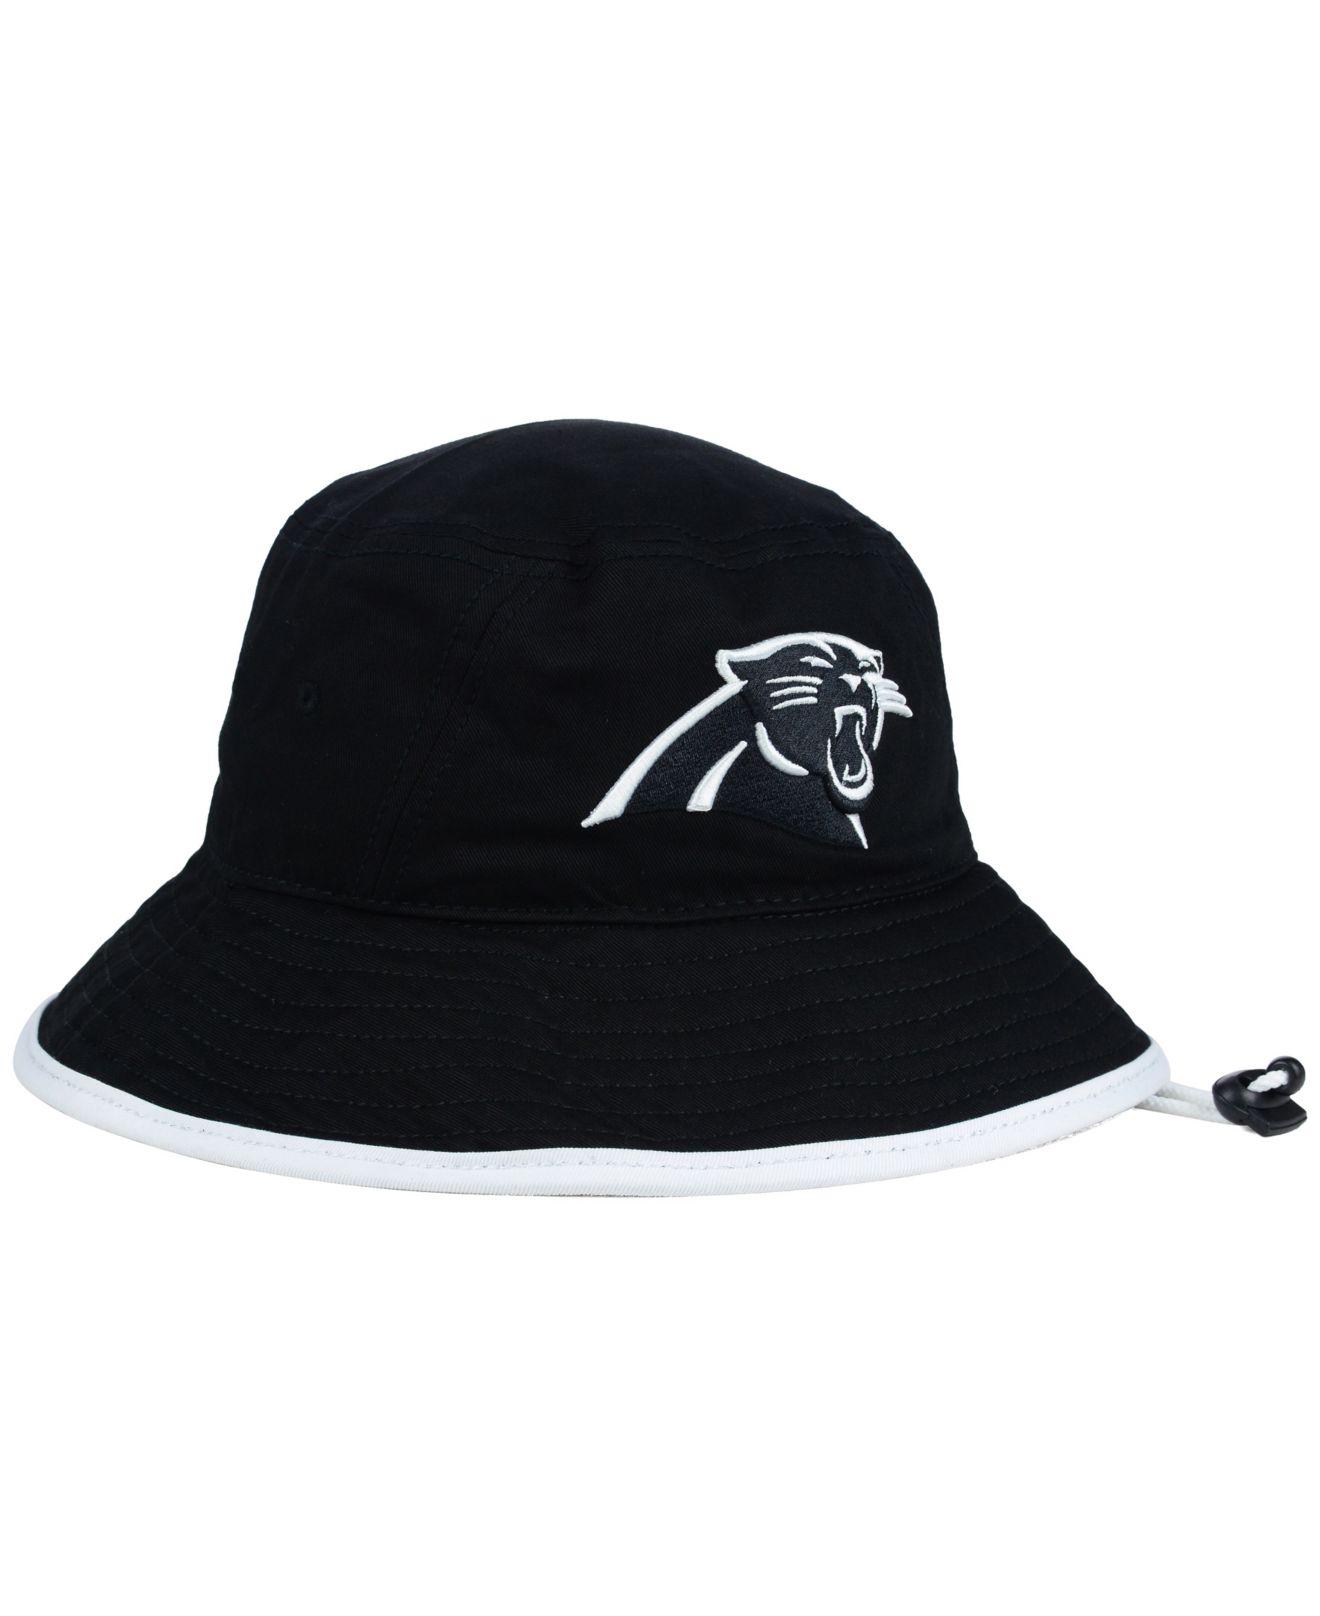 Lyst - KTZ Carolina Panthers Nfl Black White Bucket Hat in Black e70edcc70